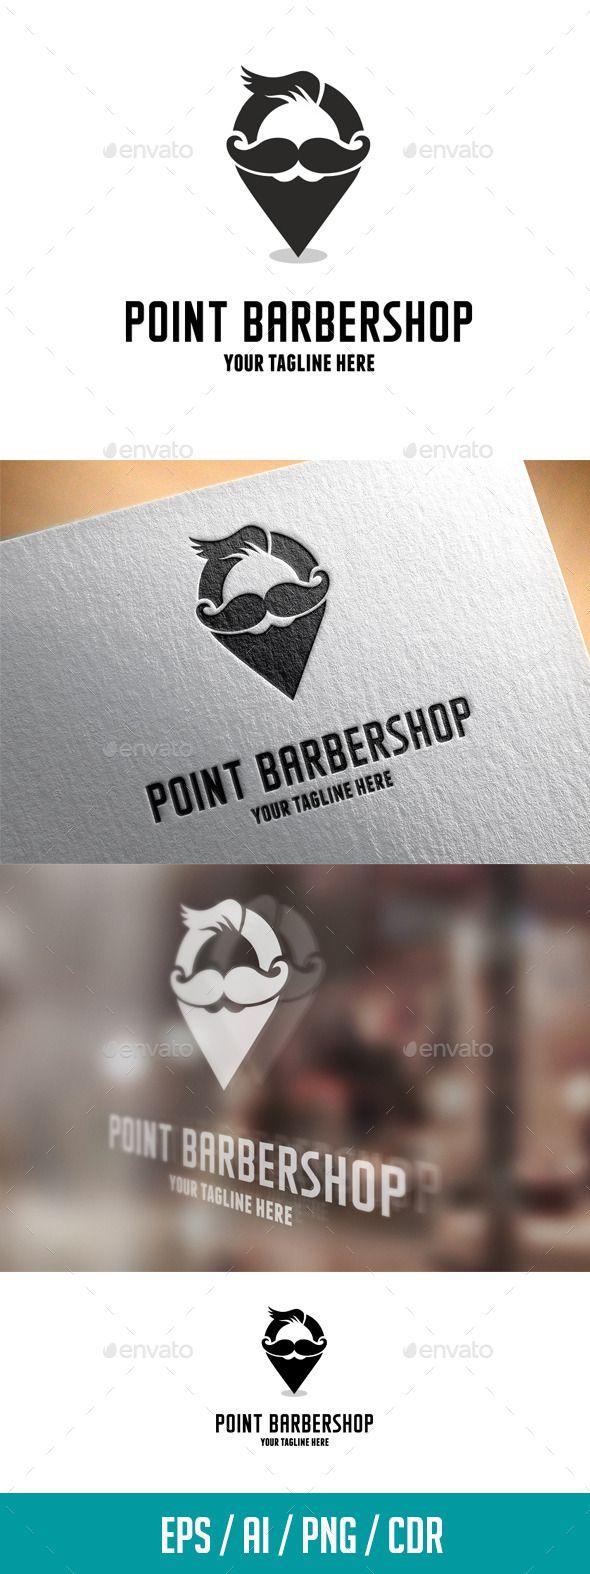 point barbershop logo template logos logo templates and symbols. Black Bedroom Furniture Sets. Home Design Ideas